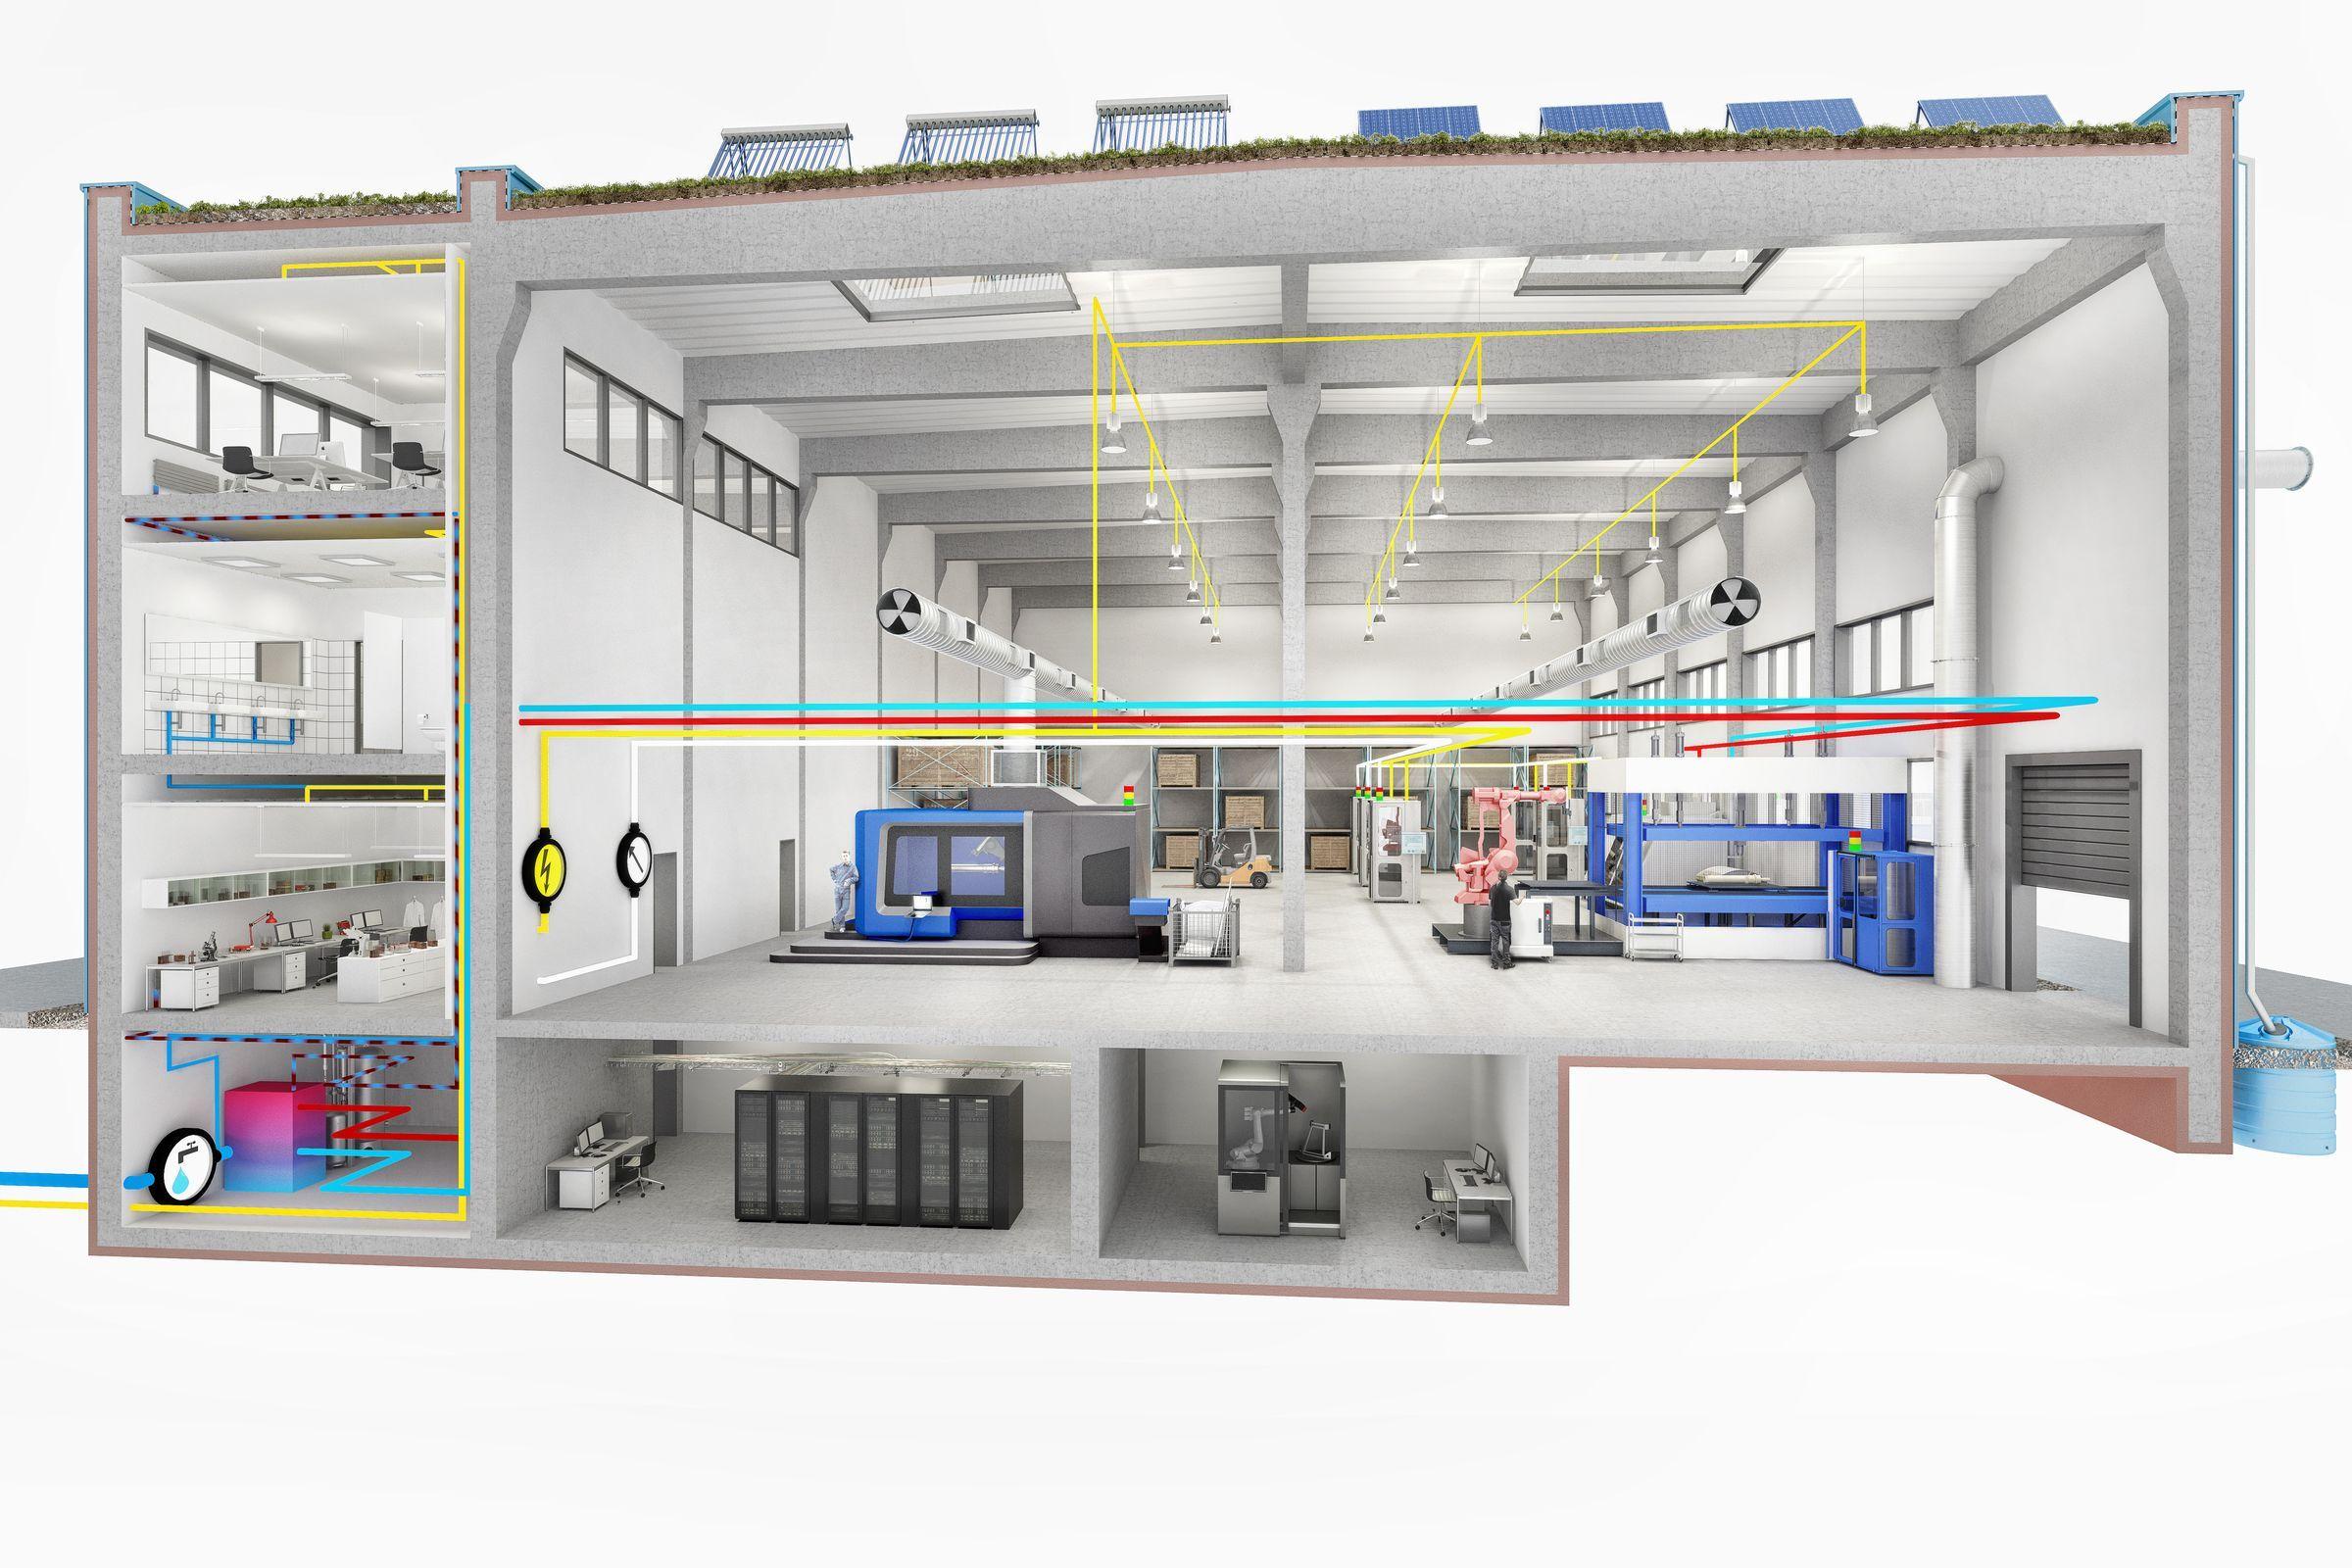 VDI_Ressourceneffizienz_3D_Fabrik_cam01_170221_01